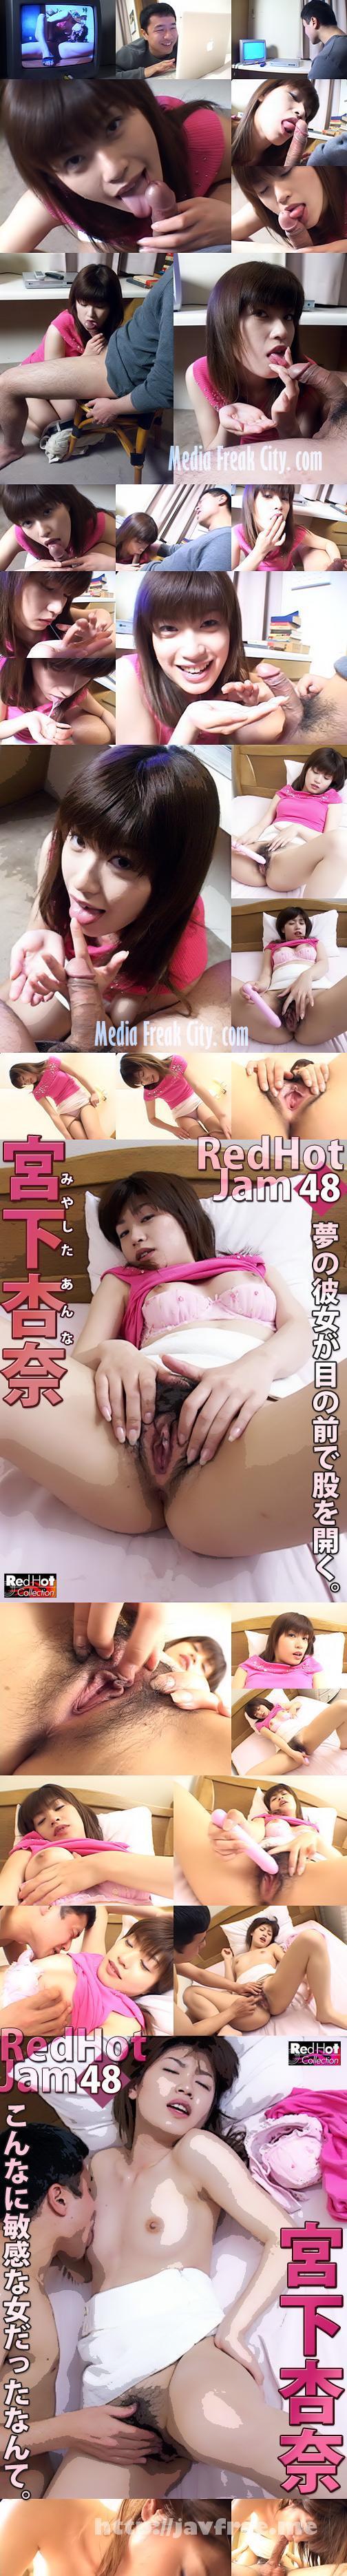 [RHJ-048] レッドホットジャム Vol.48 エッチな秘密 : 宮下杏奈 - image RHJ-048_3 on https://javfree.me